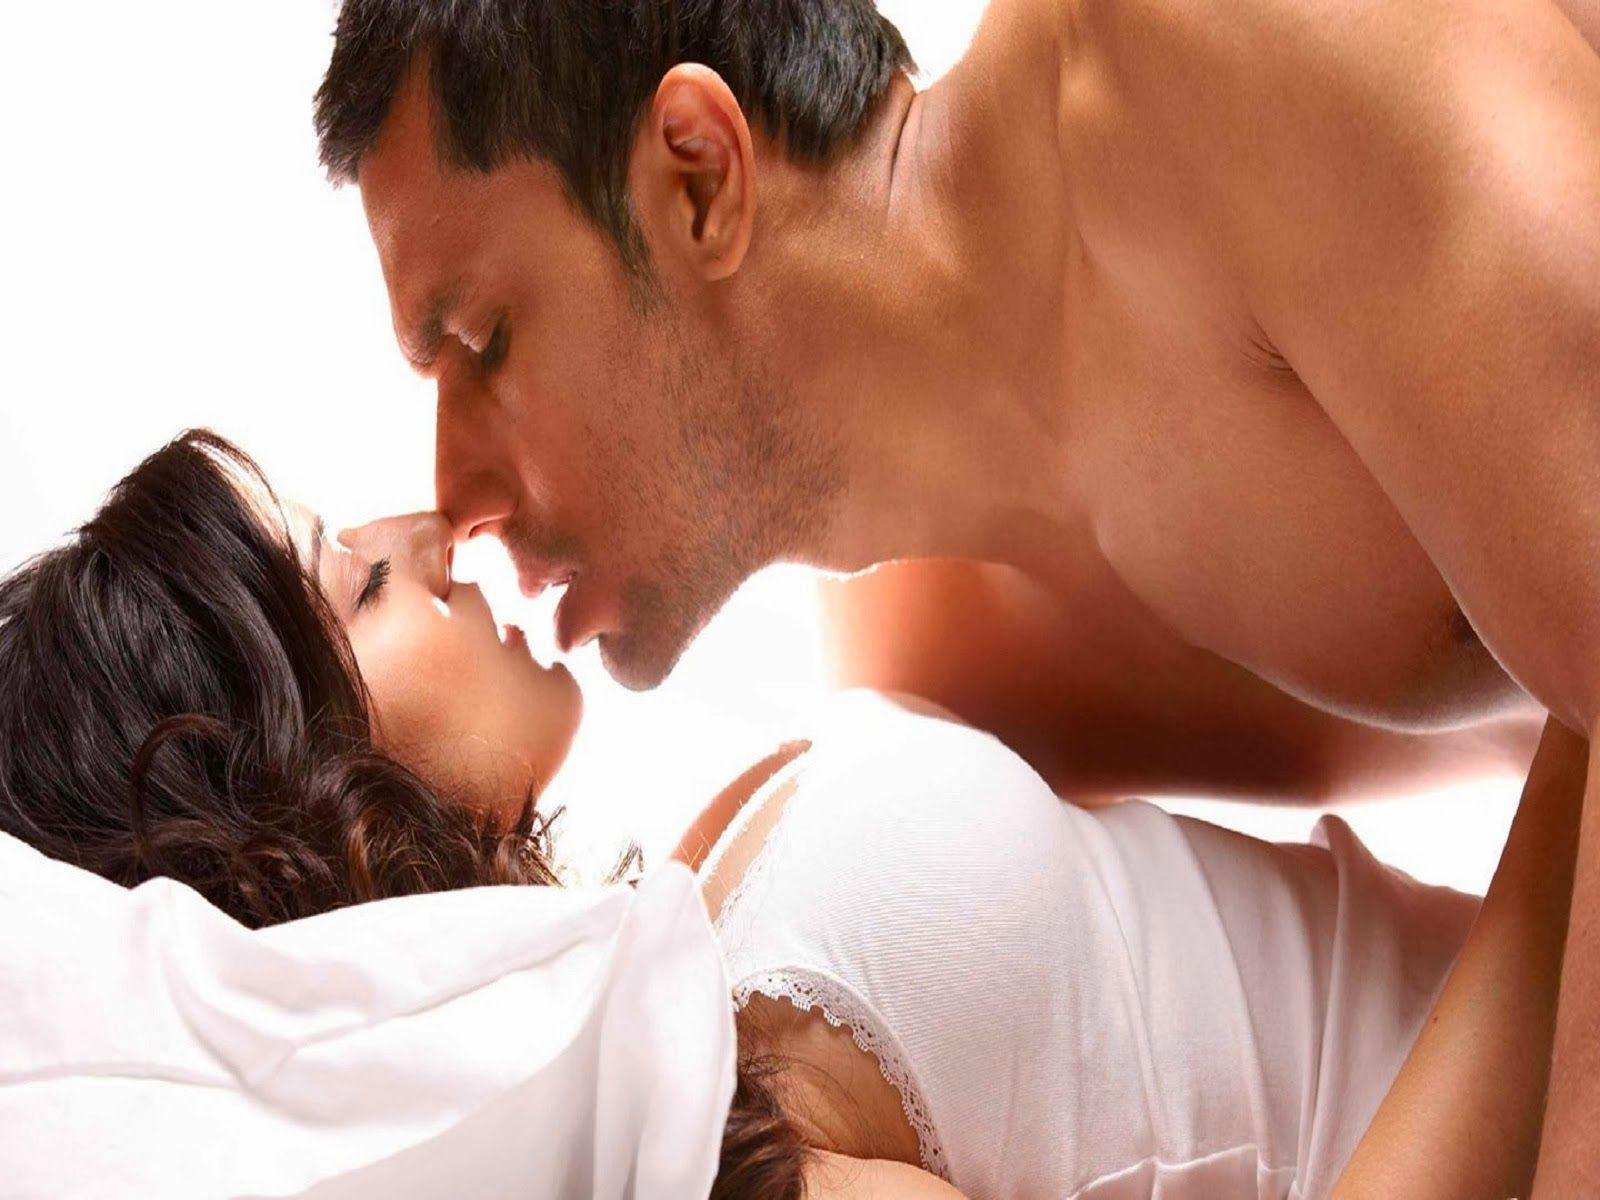 Woman womb sex kissings